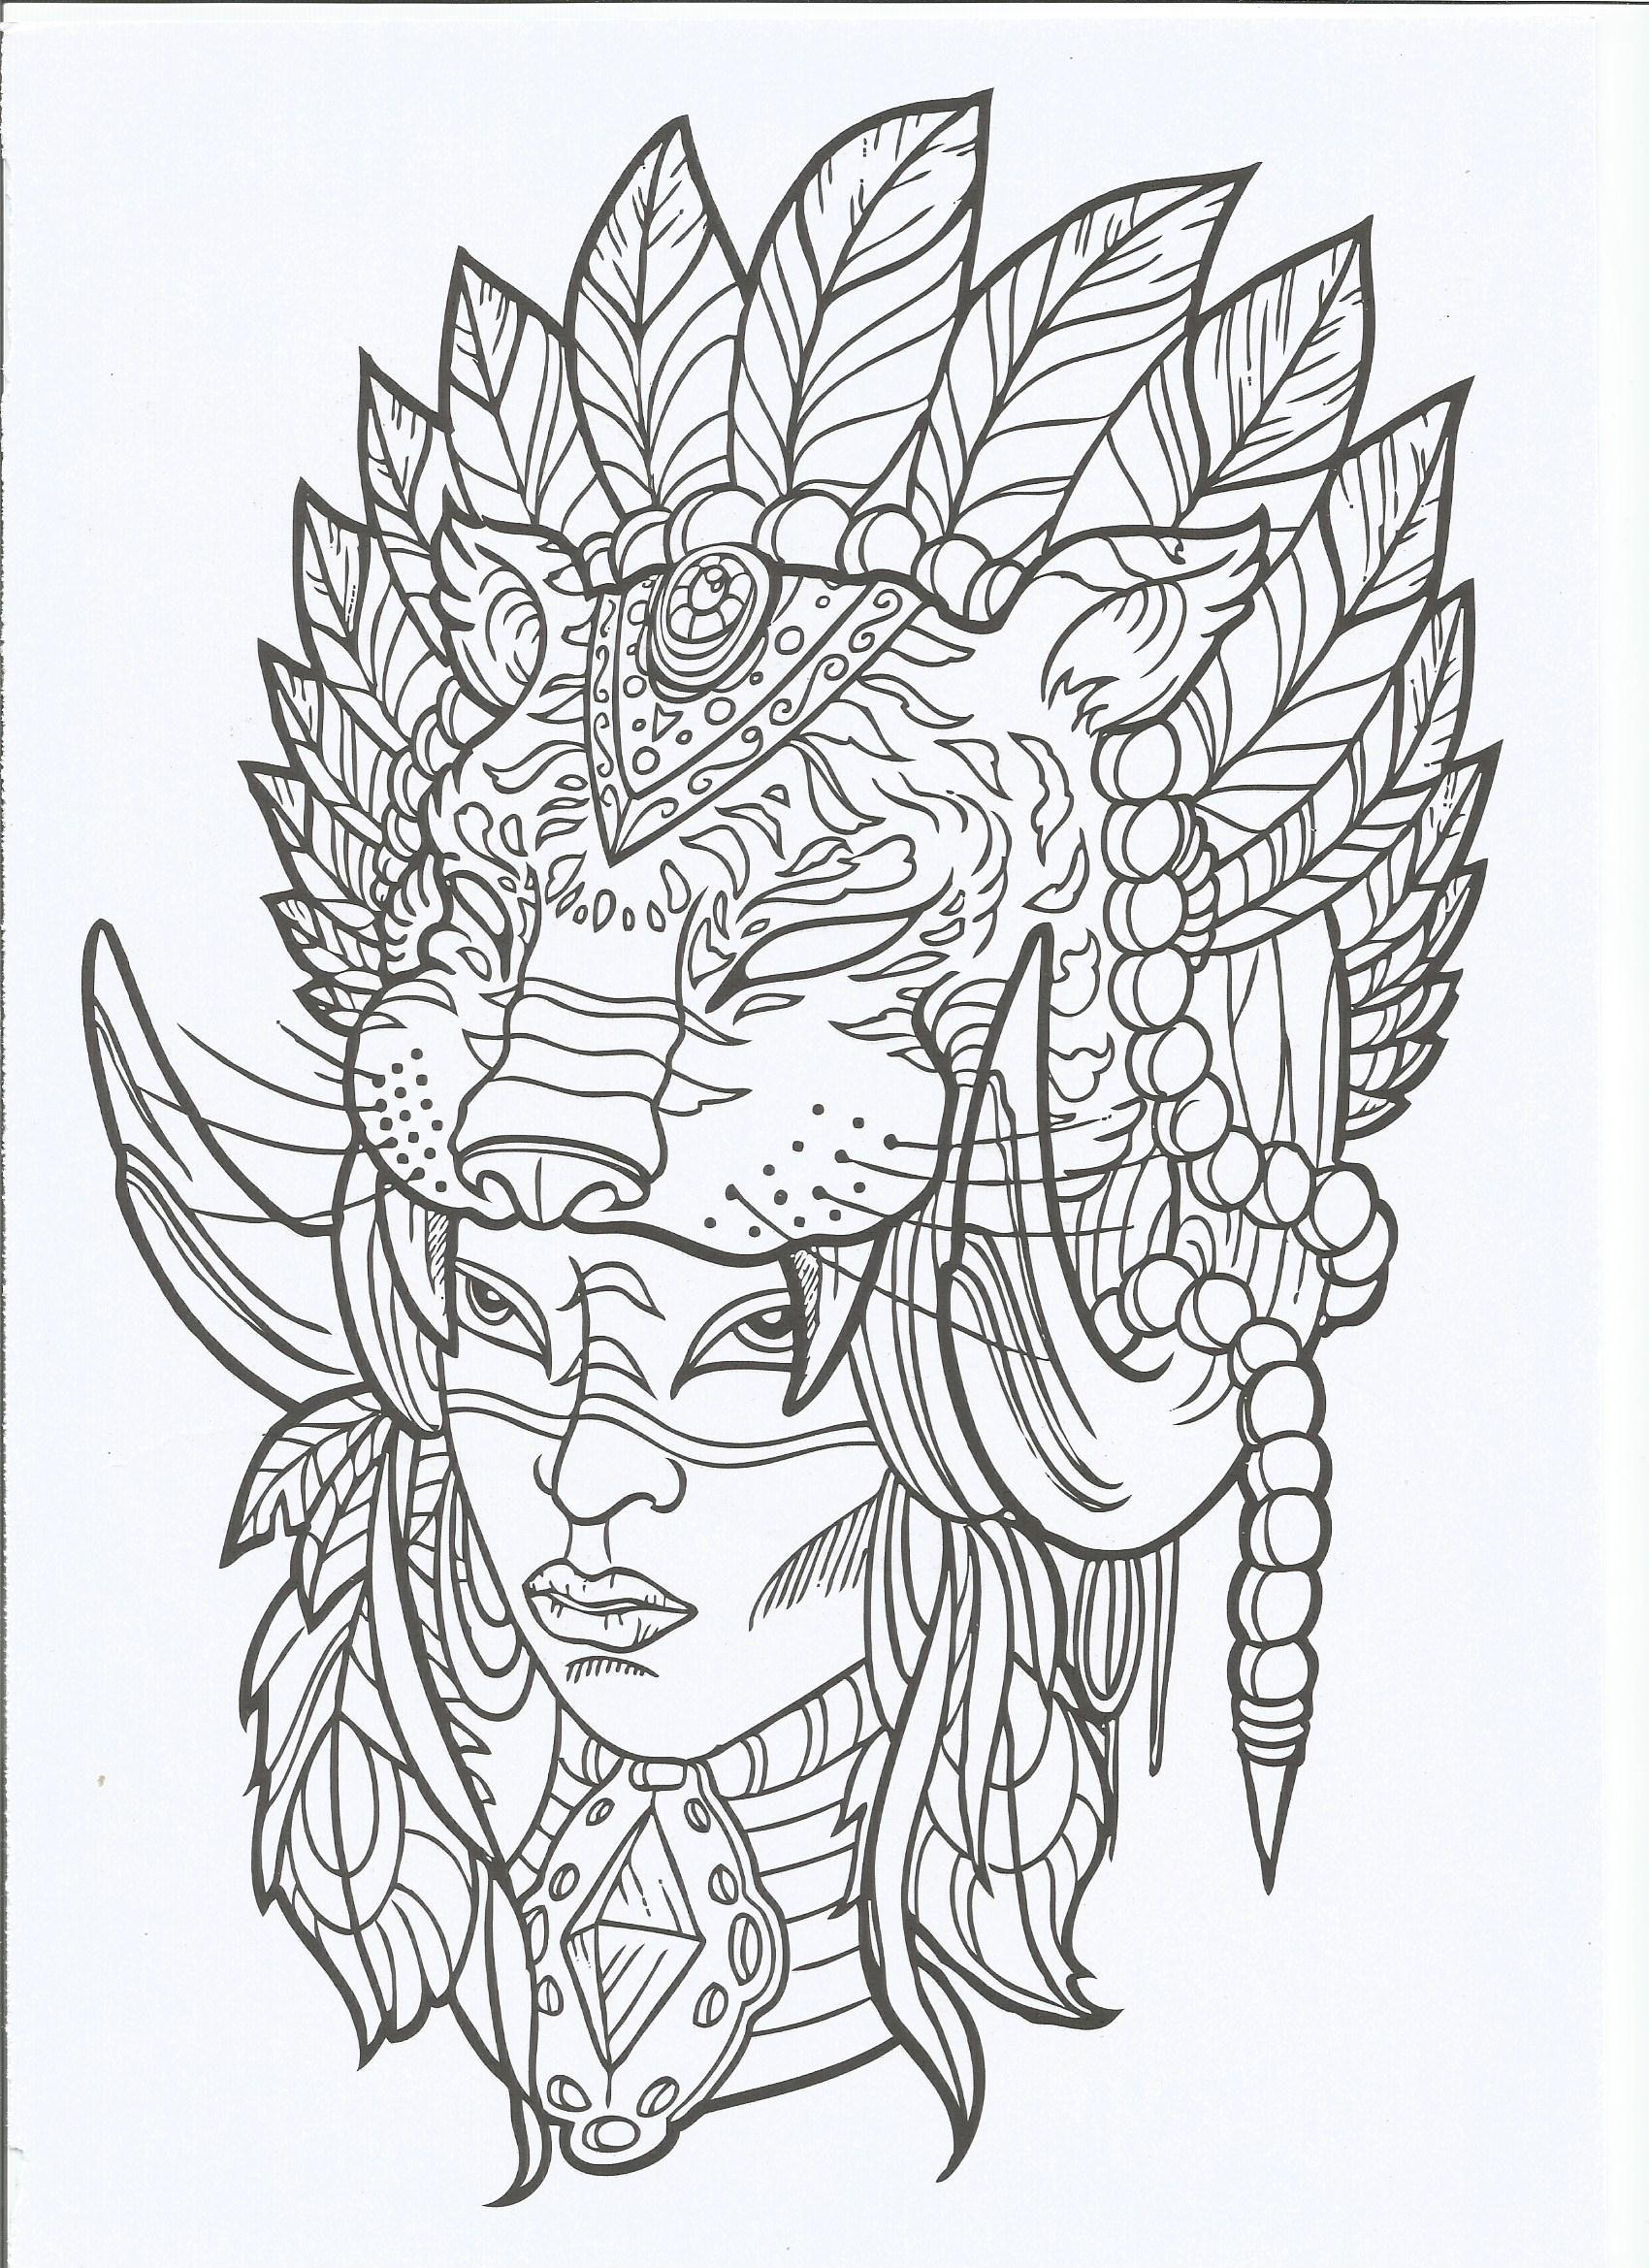 Tattoo Colouring Book Beverley Lawson Tattoo Coloring Book Color Coloring Books